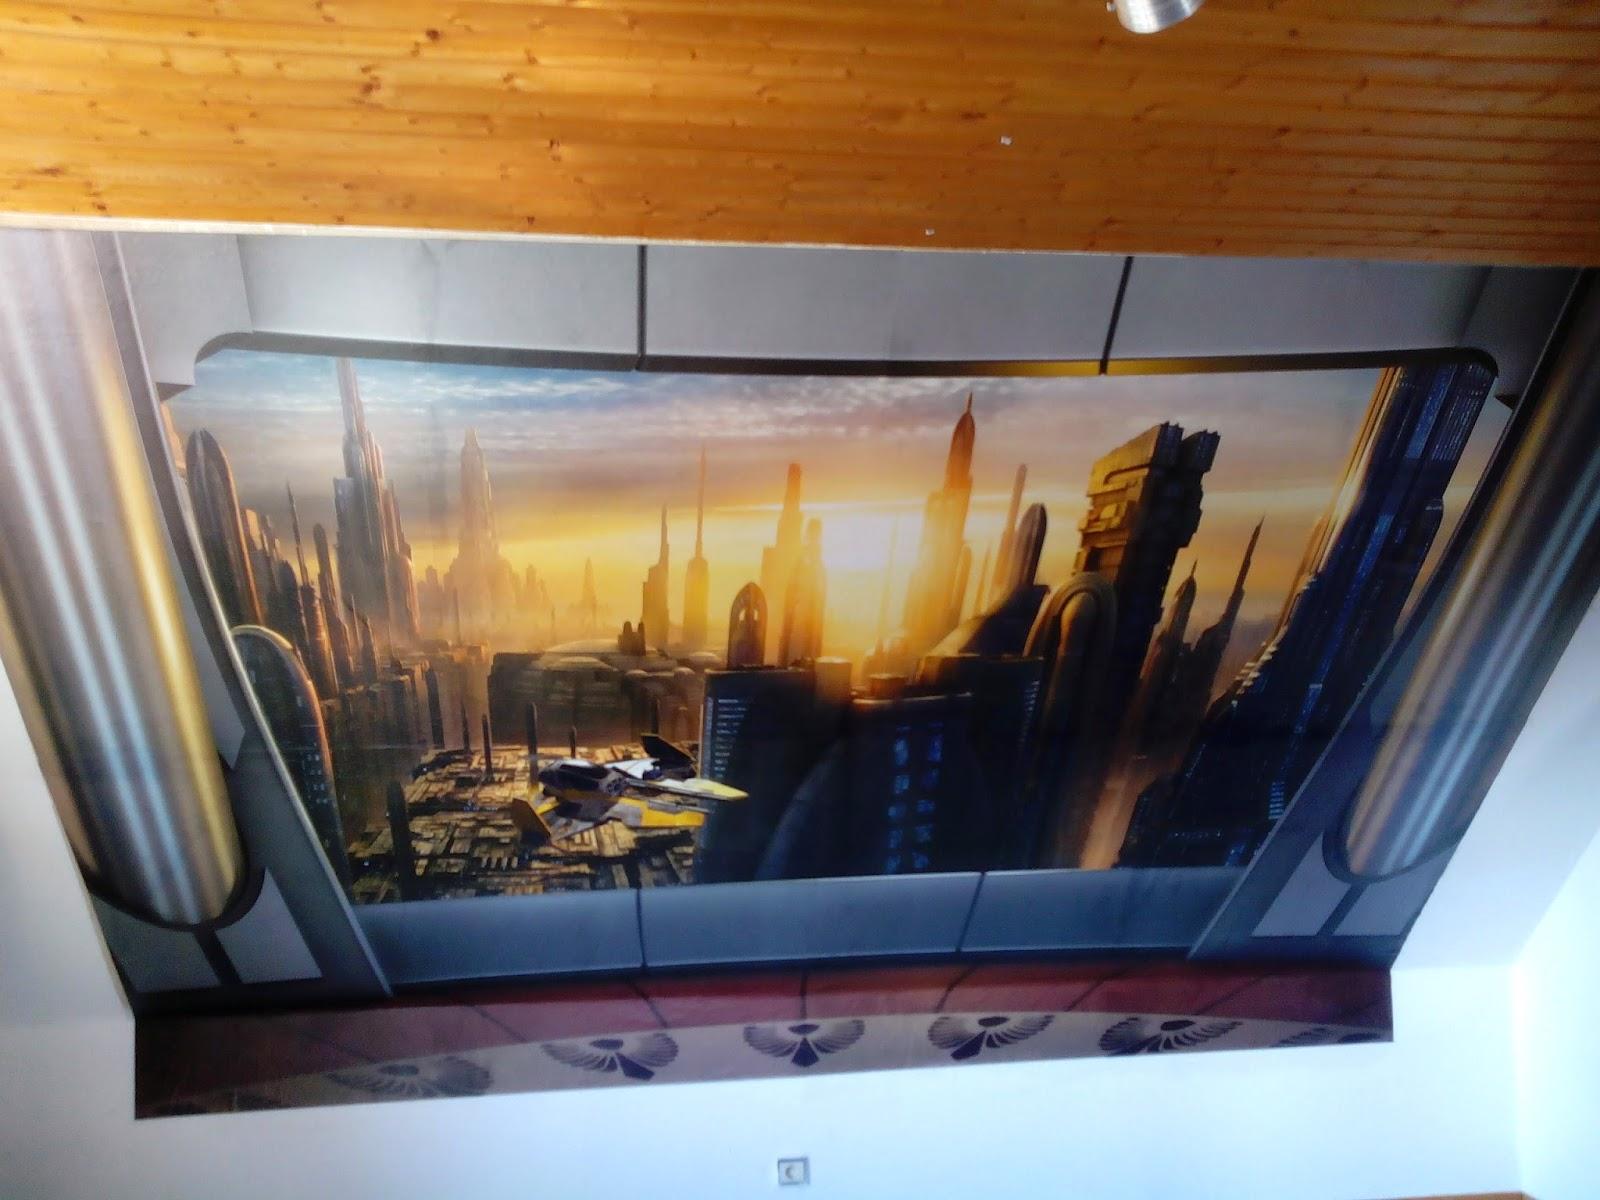 ace kaisers blog star wars der coruscant view. Black Bedroom Furniture Sets. Home Design Ideas